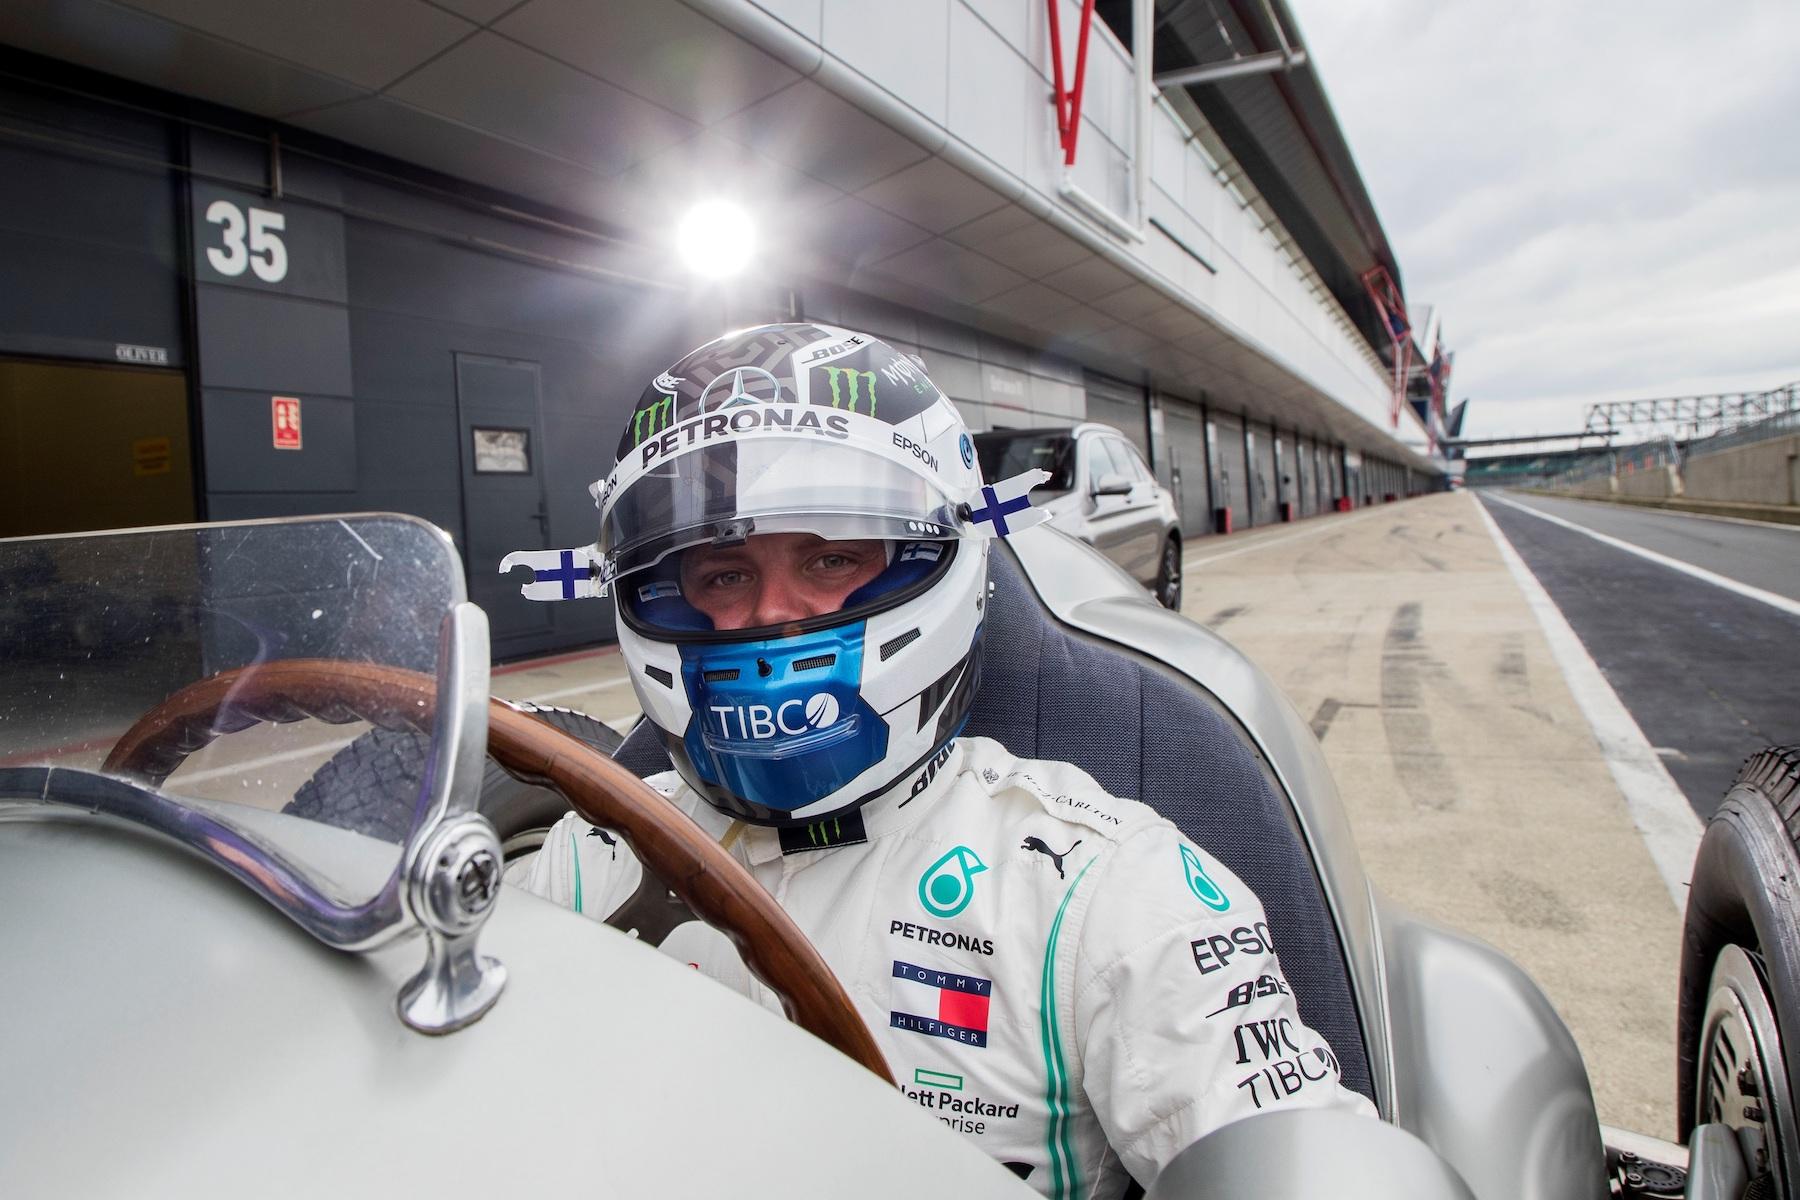 2019 Mercedes 125 years in Motorsports celebration | 2019 Silverstone 7.jpg